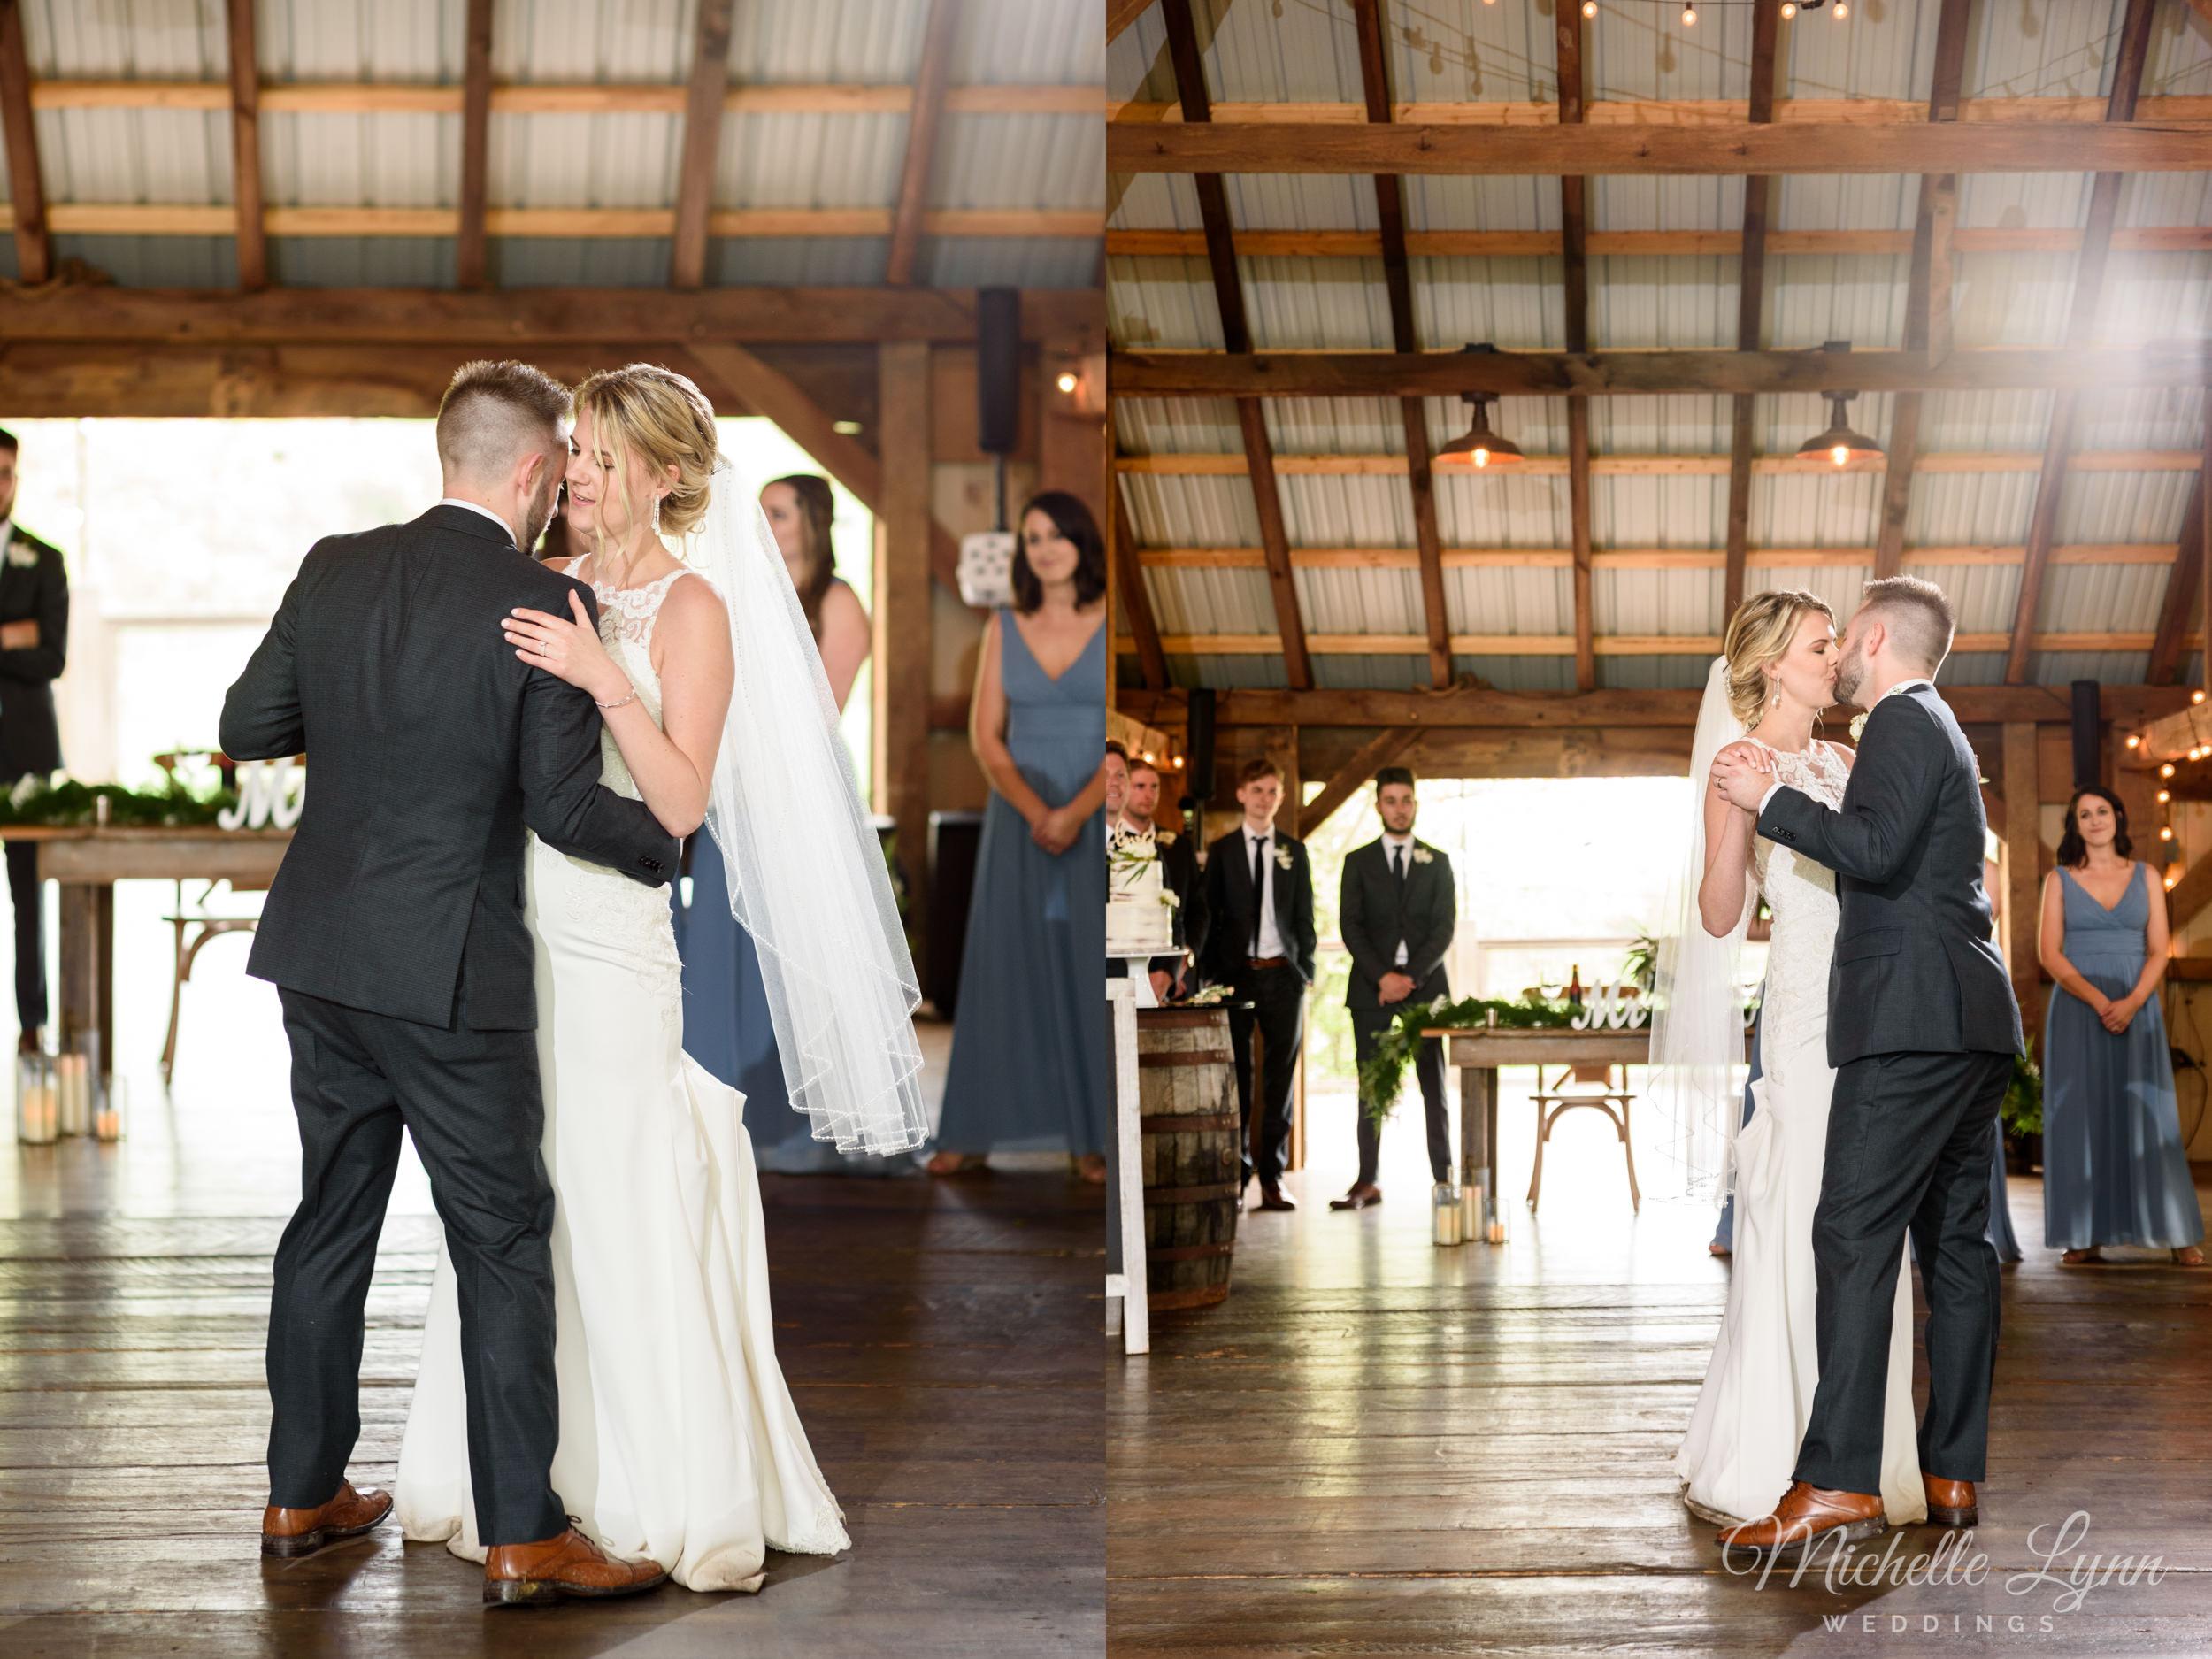 mlw-the-farm-bakery-and-events-wedding-photos-62.jpg